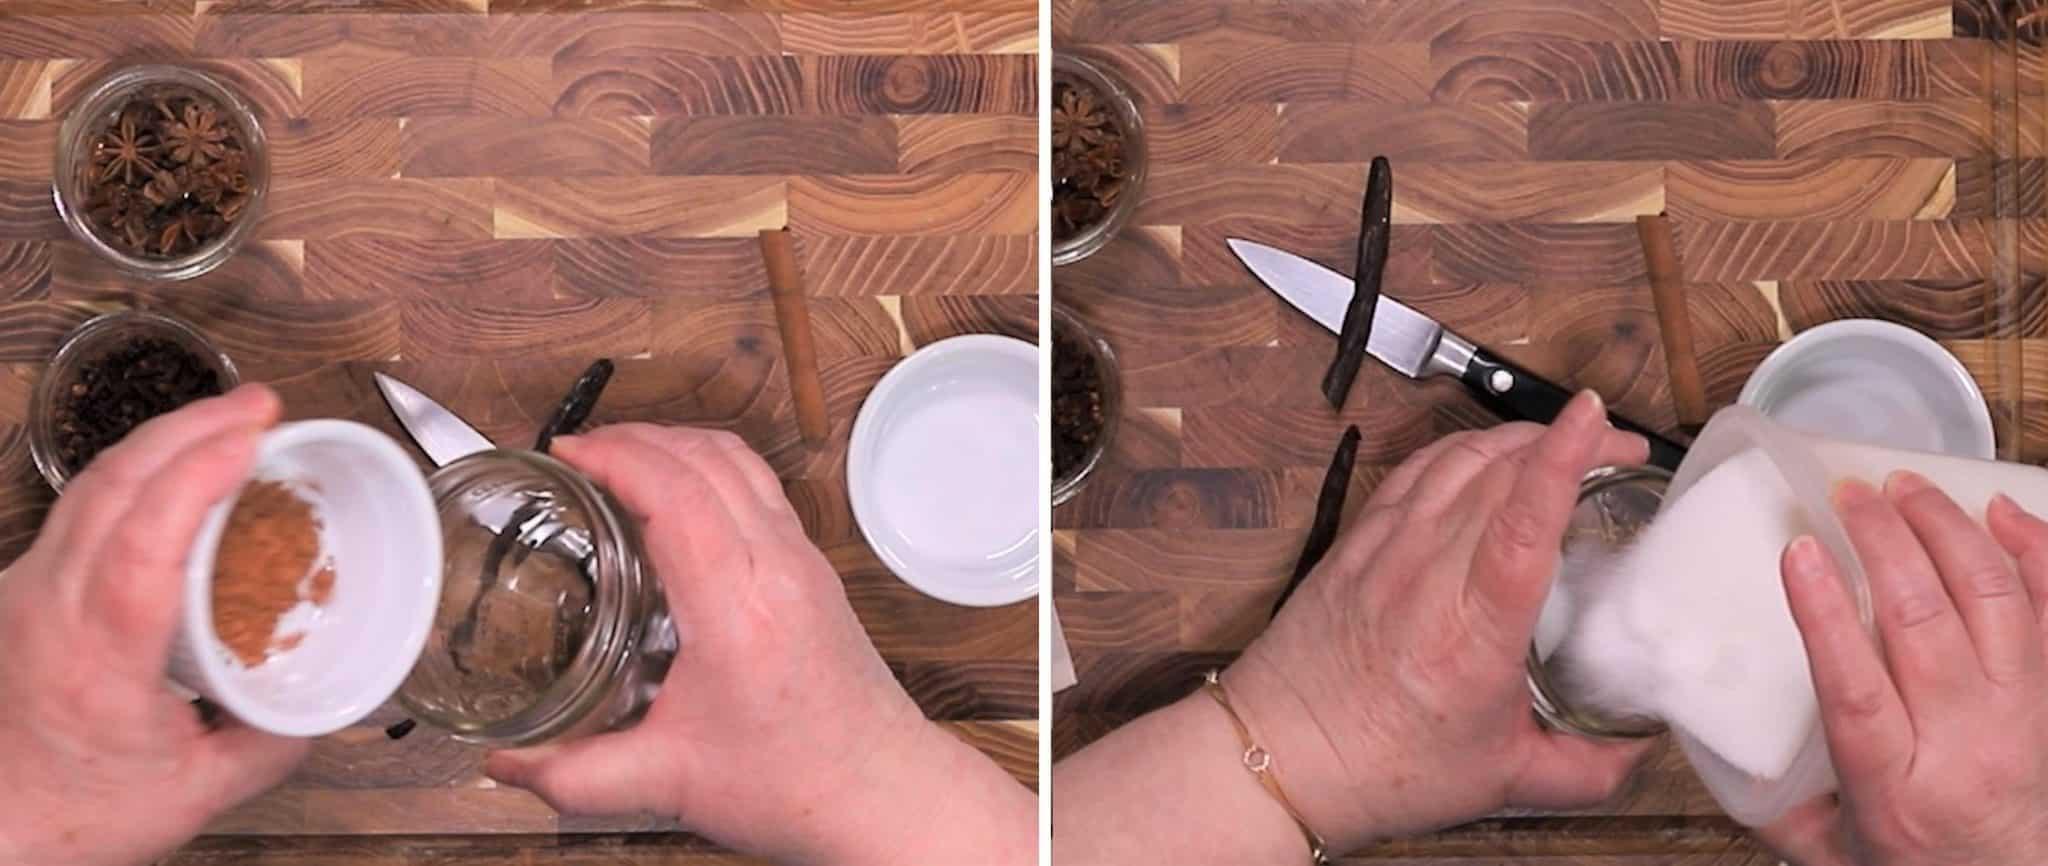 Add Cocoa and Sugar to Mason Jar